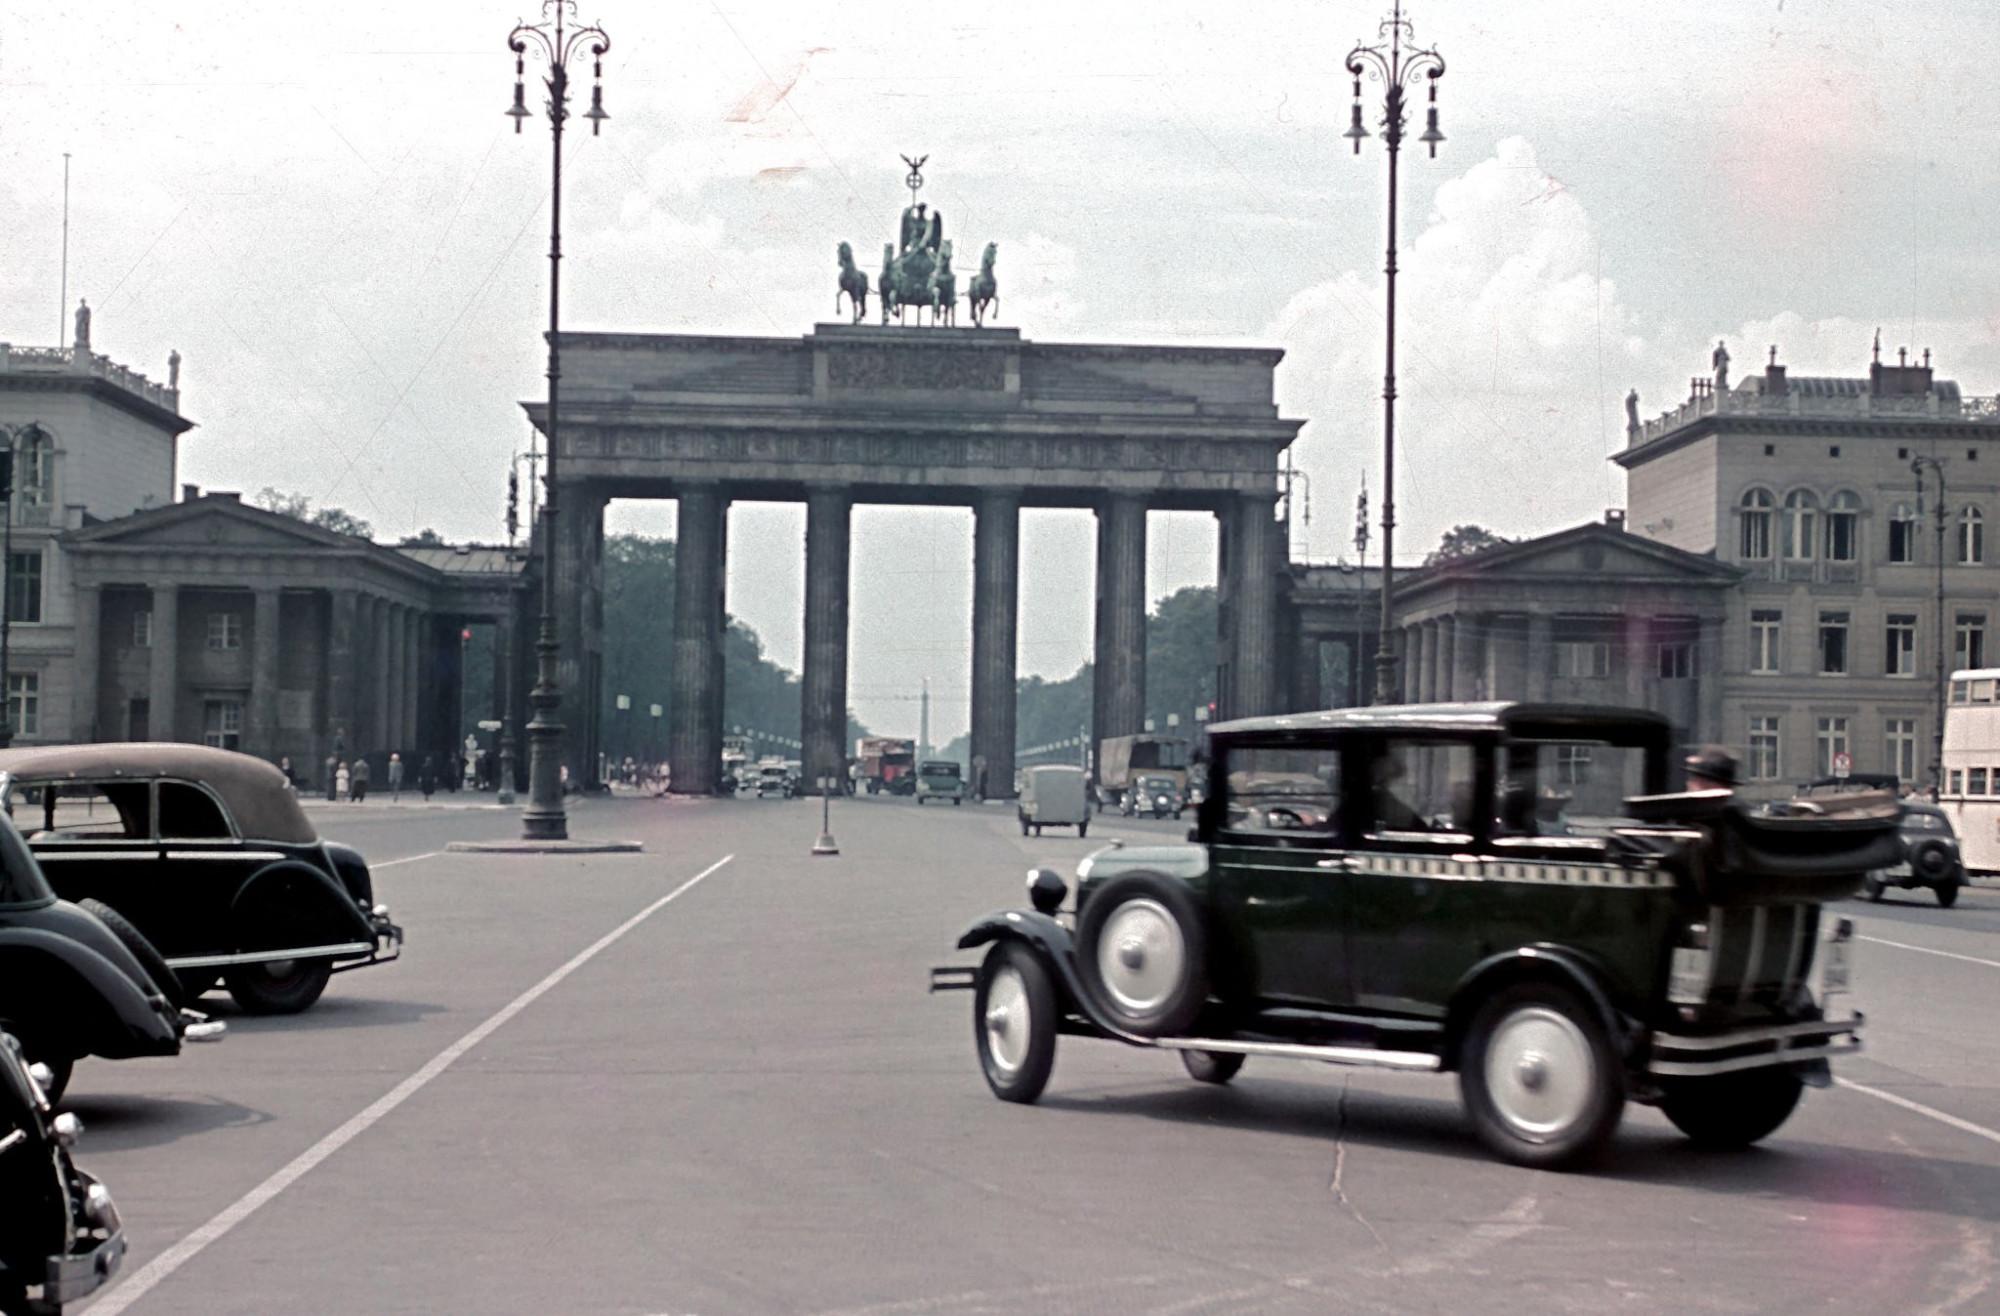 1939 Berlin Pariser Platz and Brandenburger Tor by Sobotta